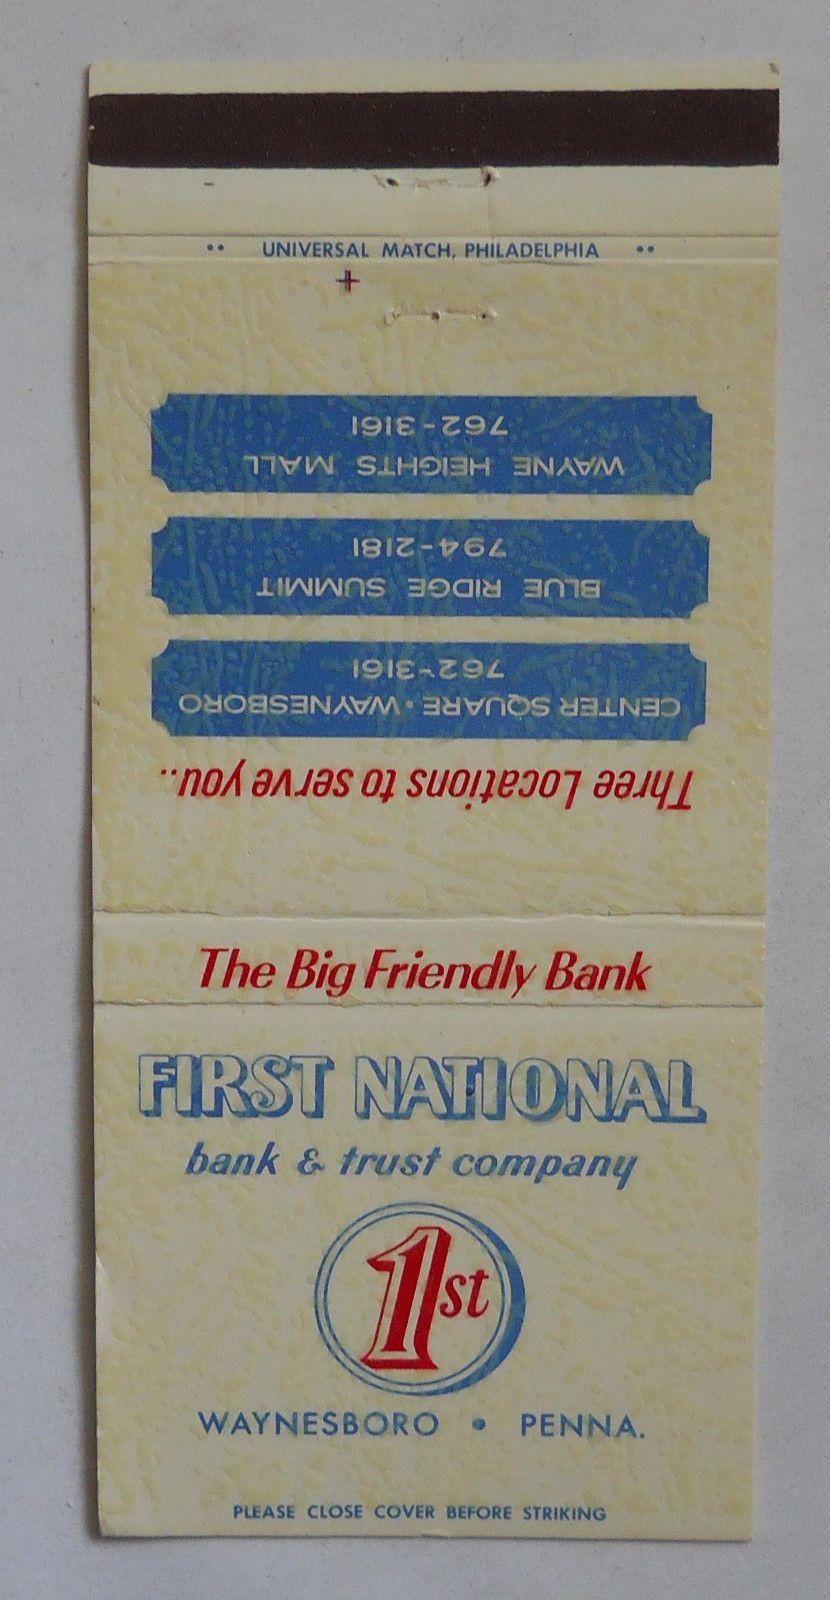 158 first national bank trust company waynesboro pa